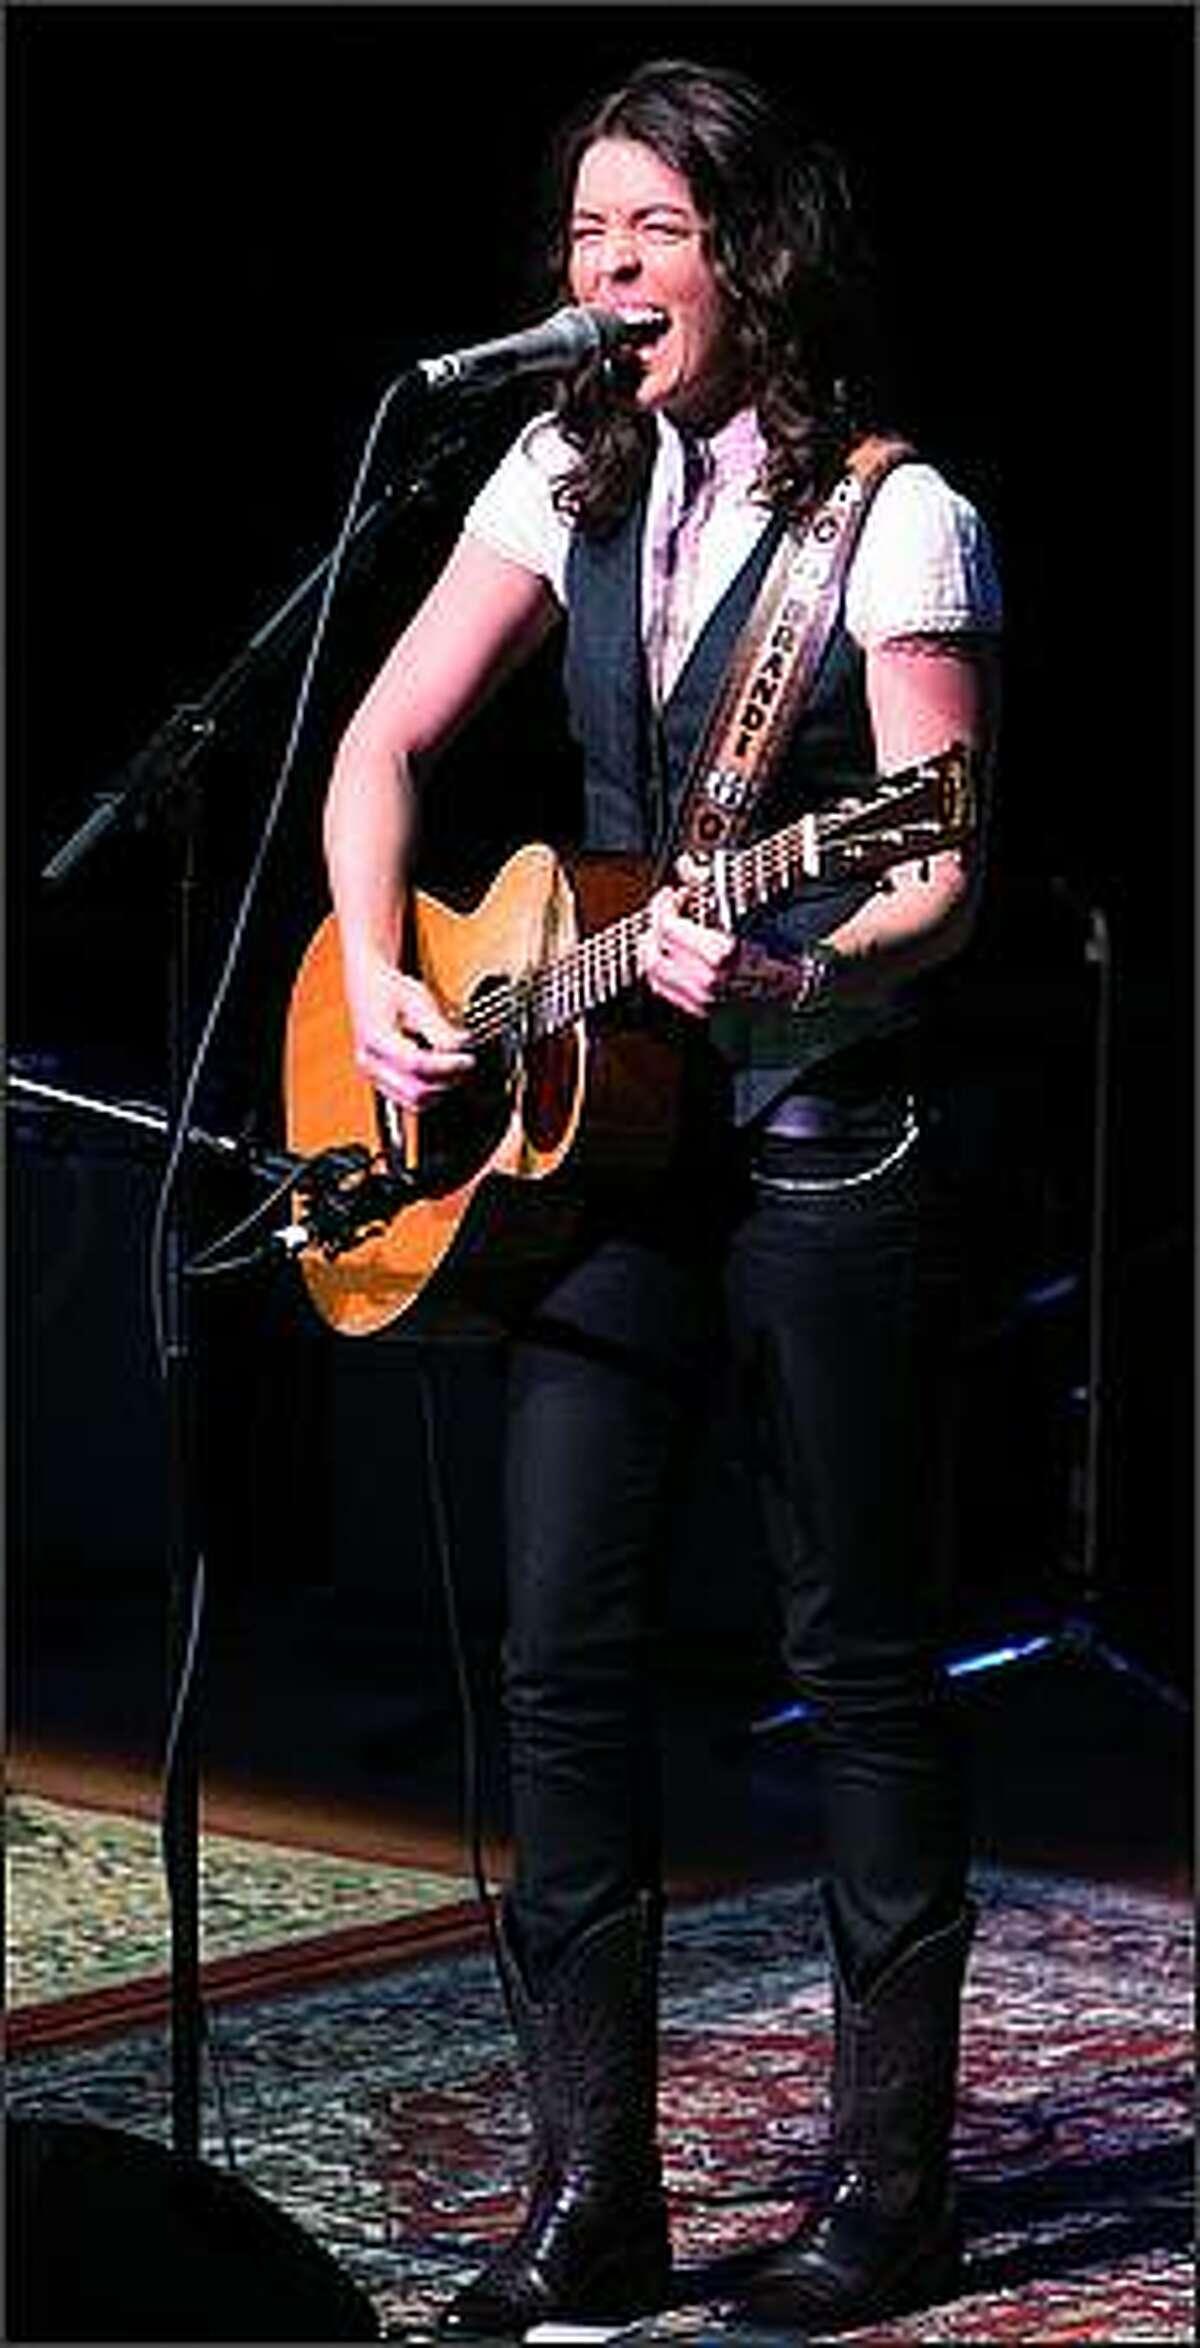 Brandi Carlile, a Seattle native, performs at Benaroya Hall.